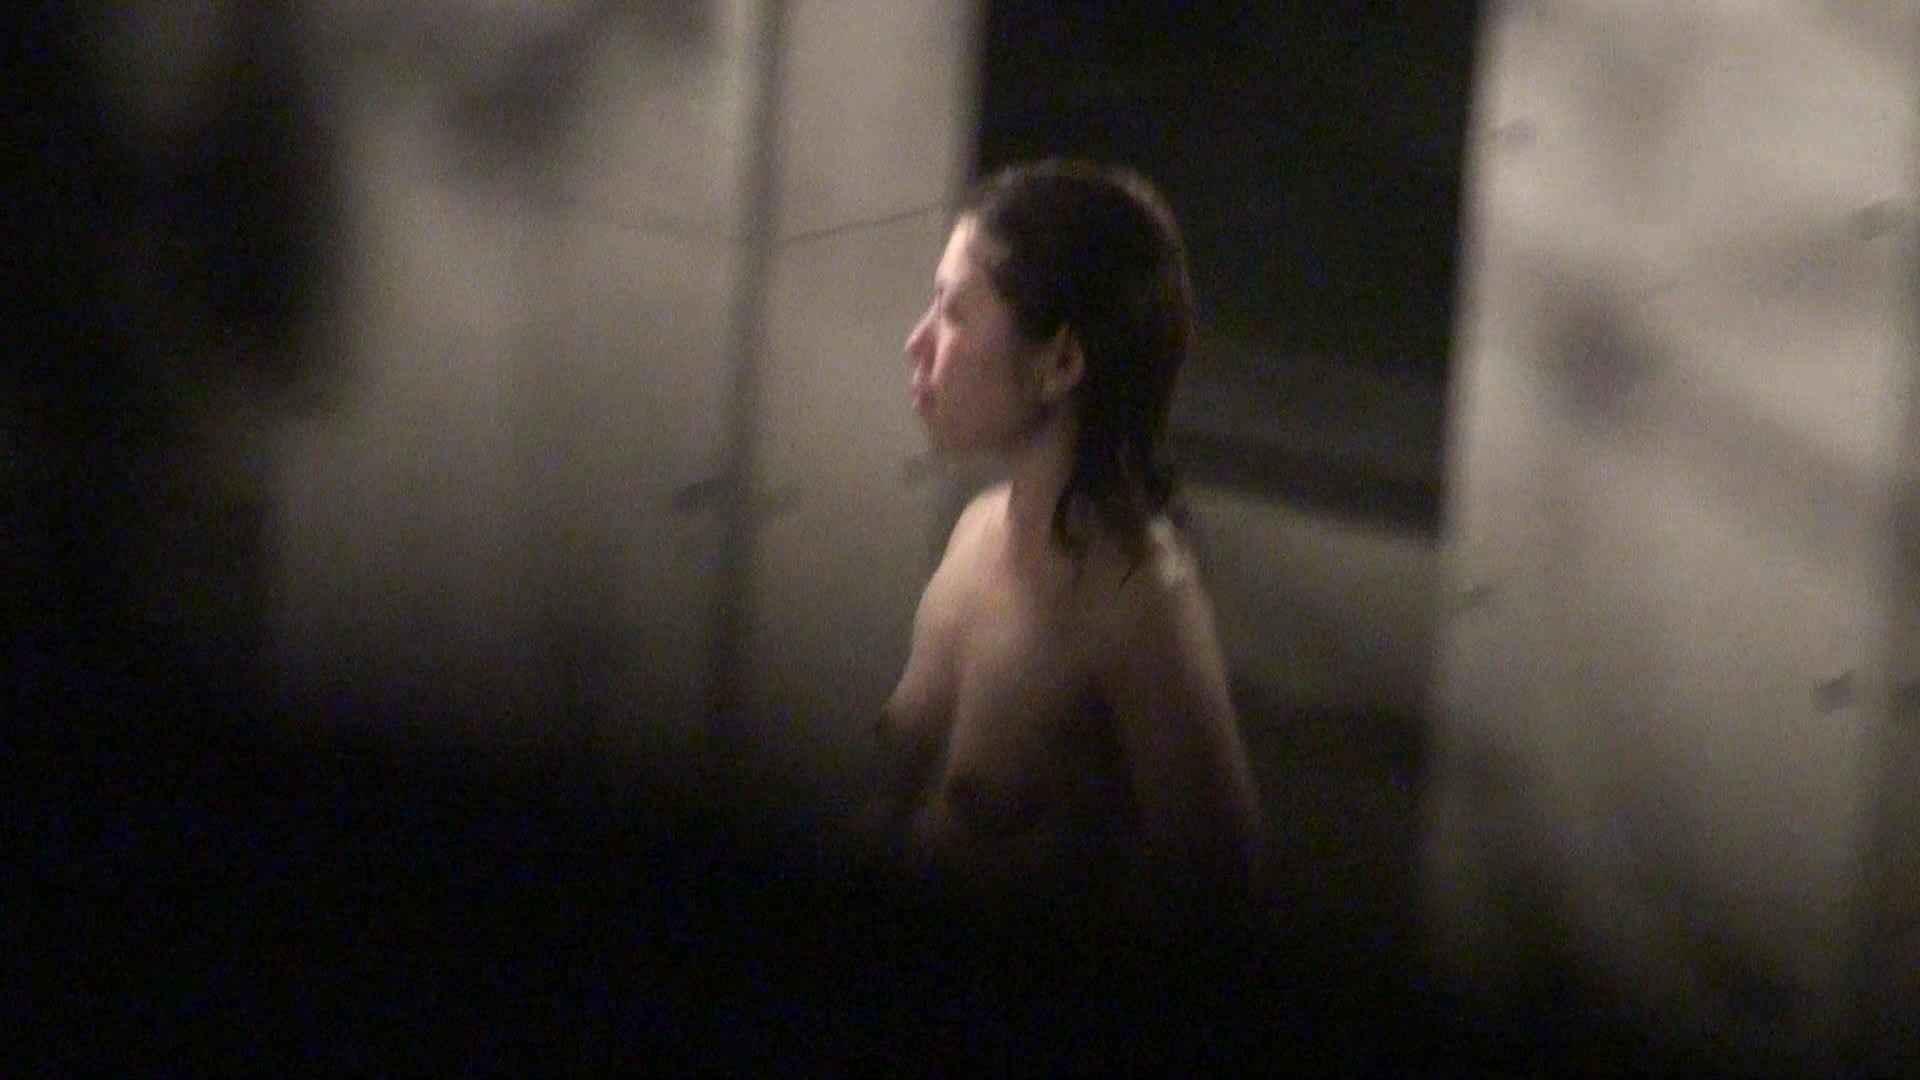 Aquaな露天風呂Vol.327 盗撮特撮 | OLのプライベート  10pic 4